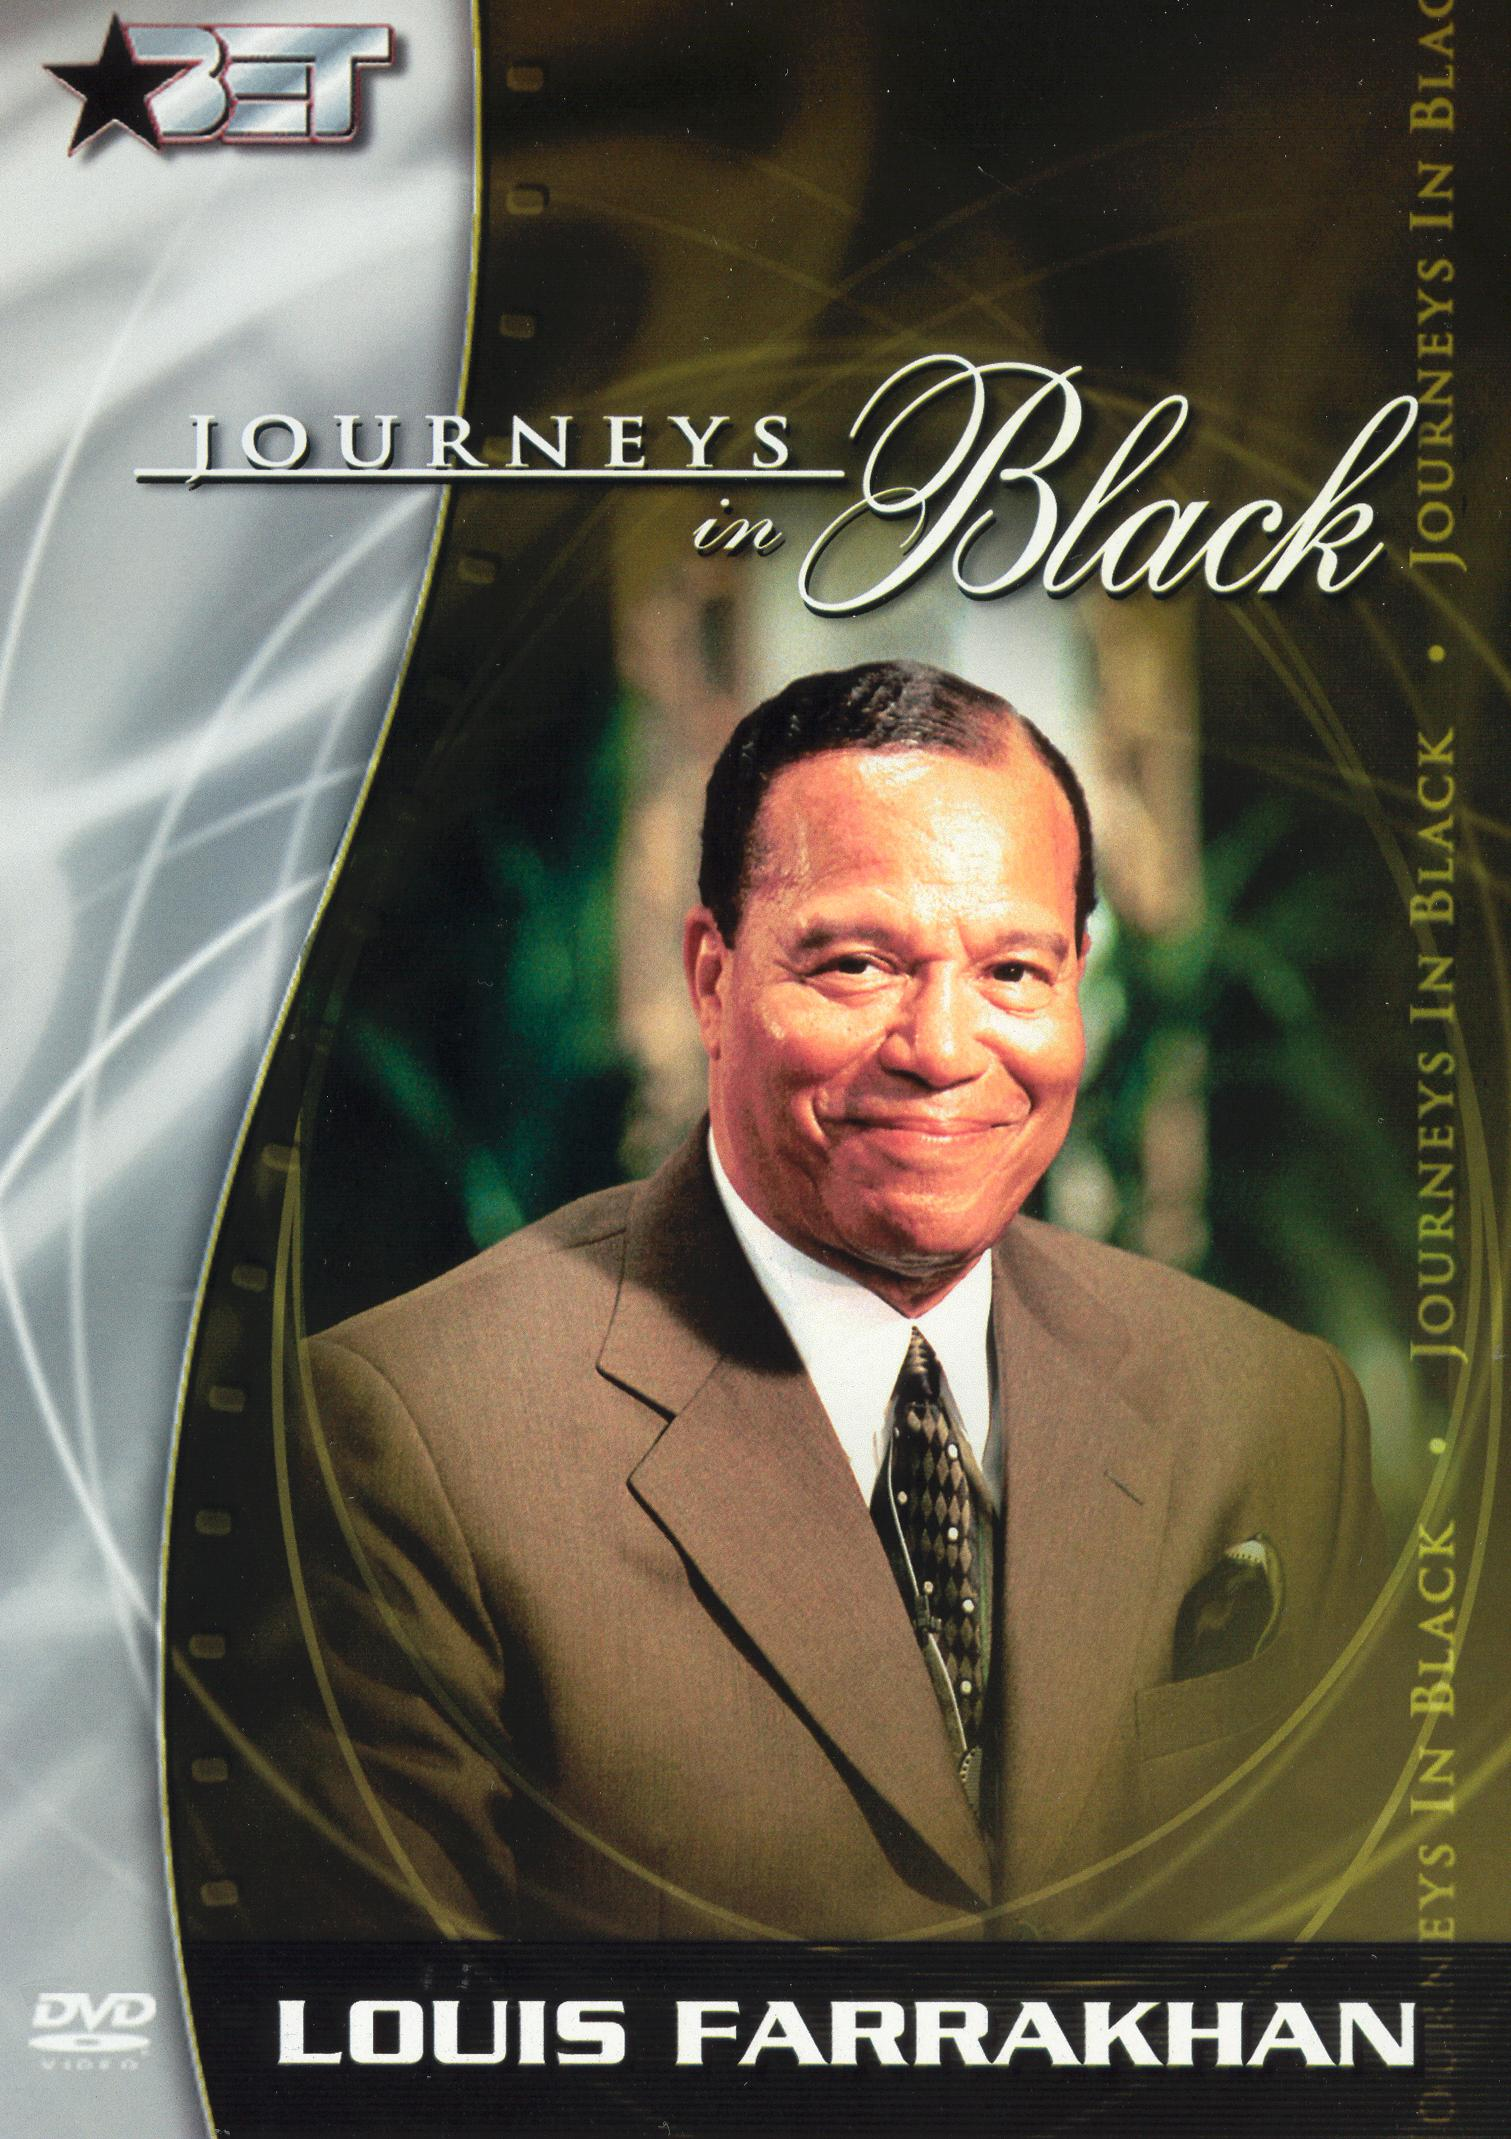 Journeys in Black: Louis Farrakhan